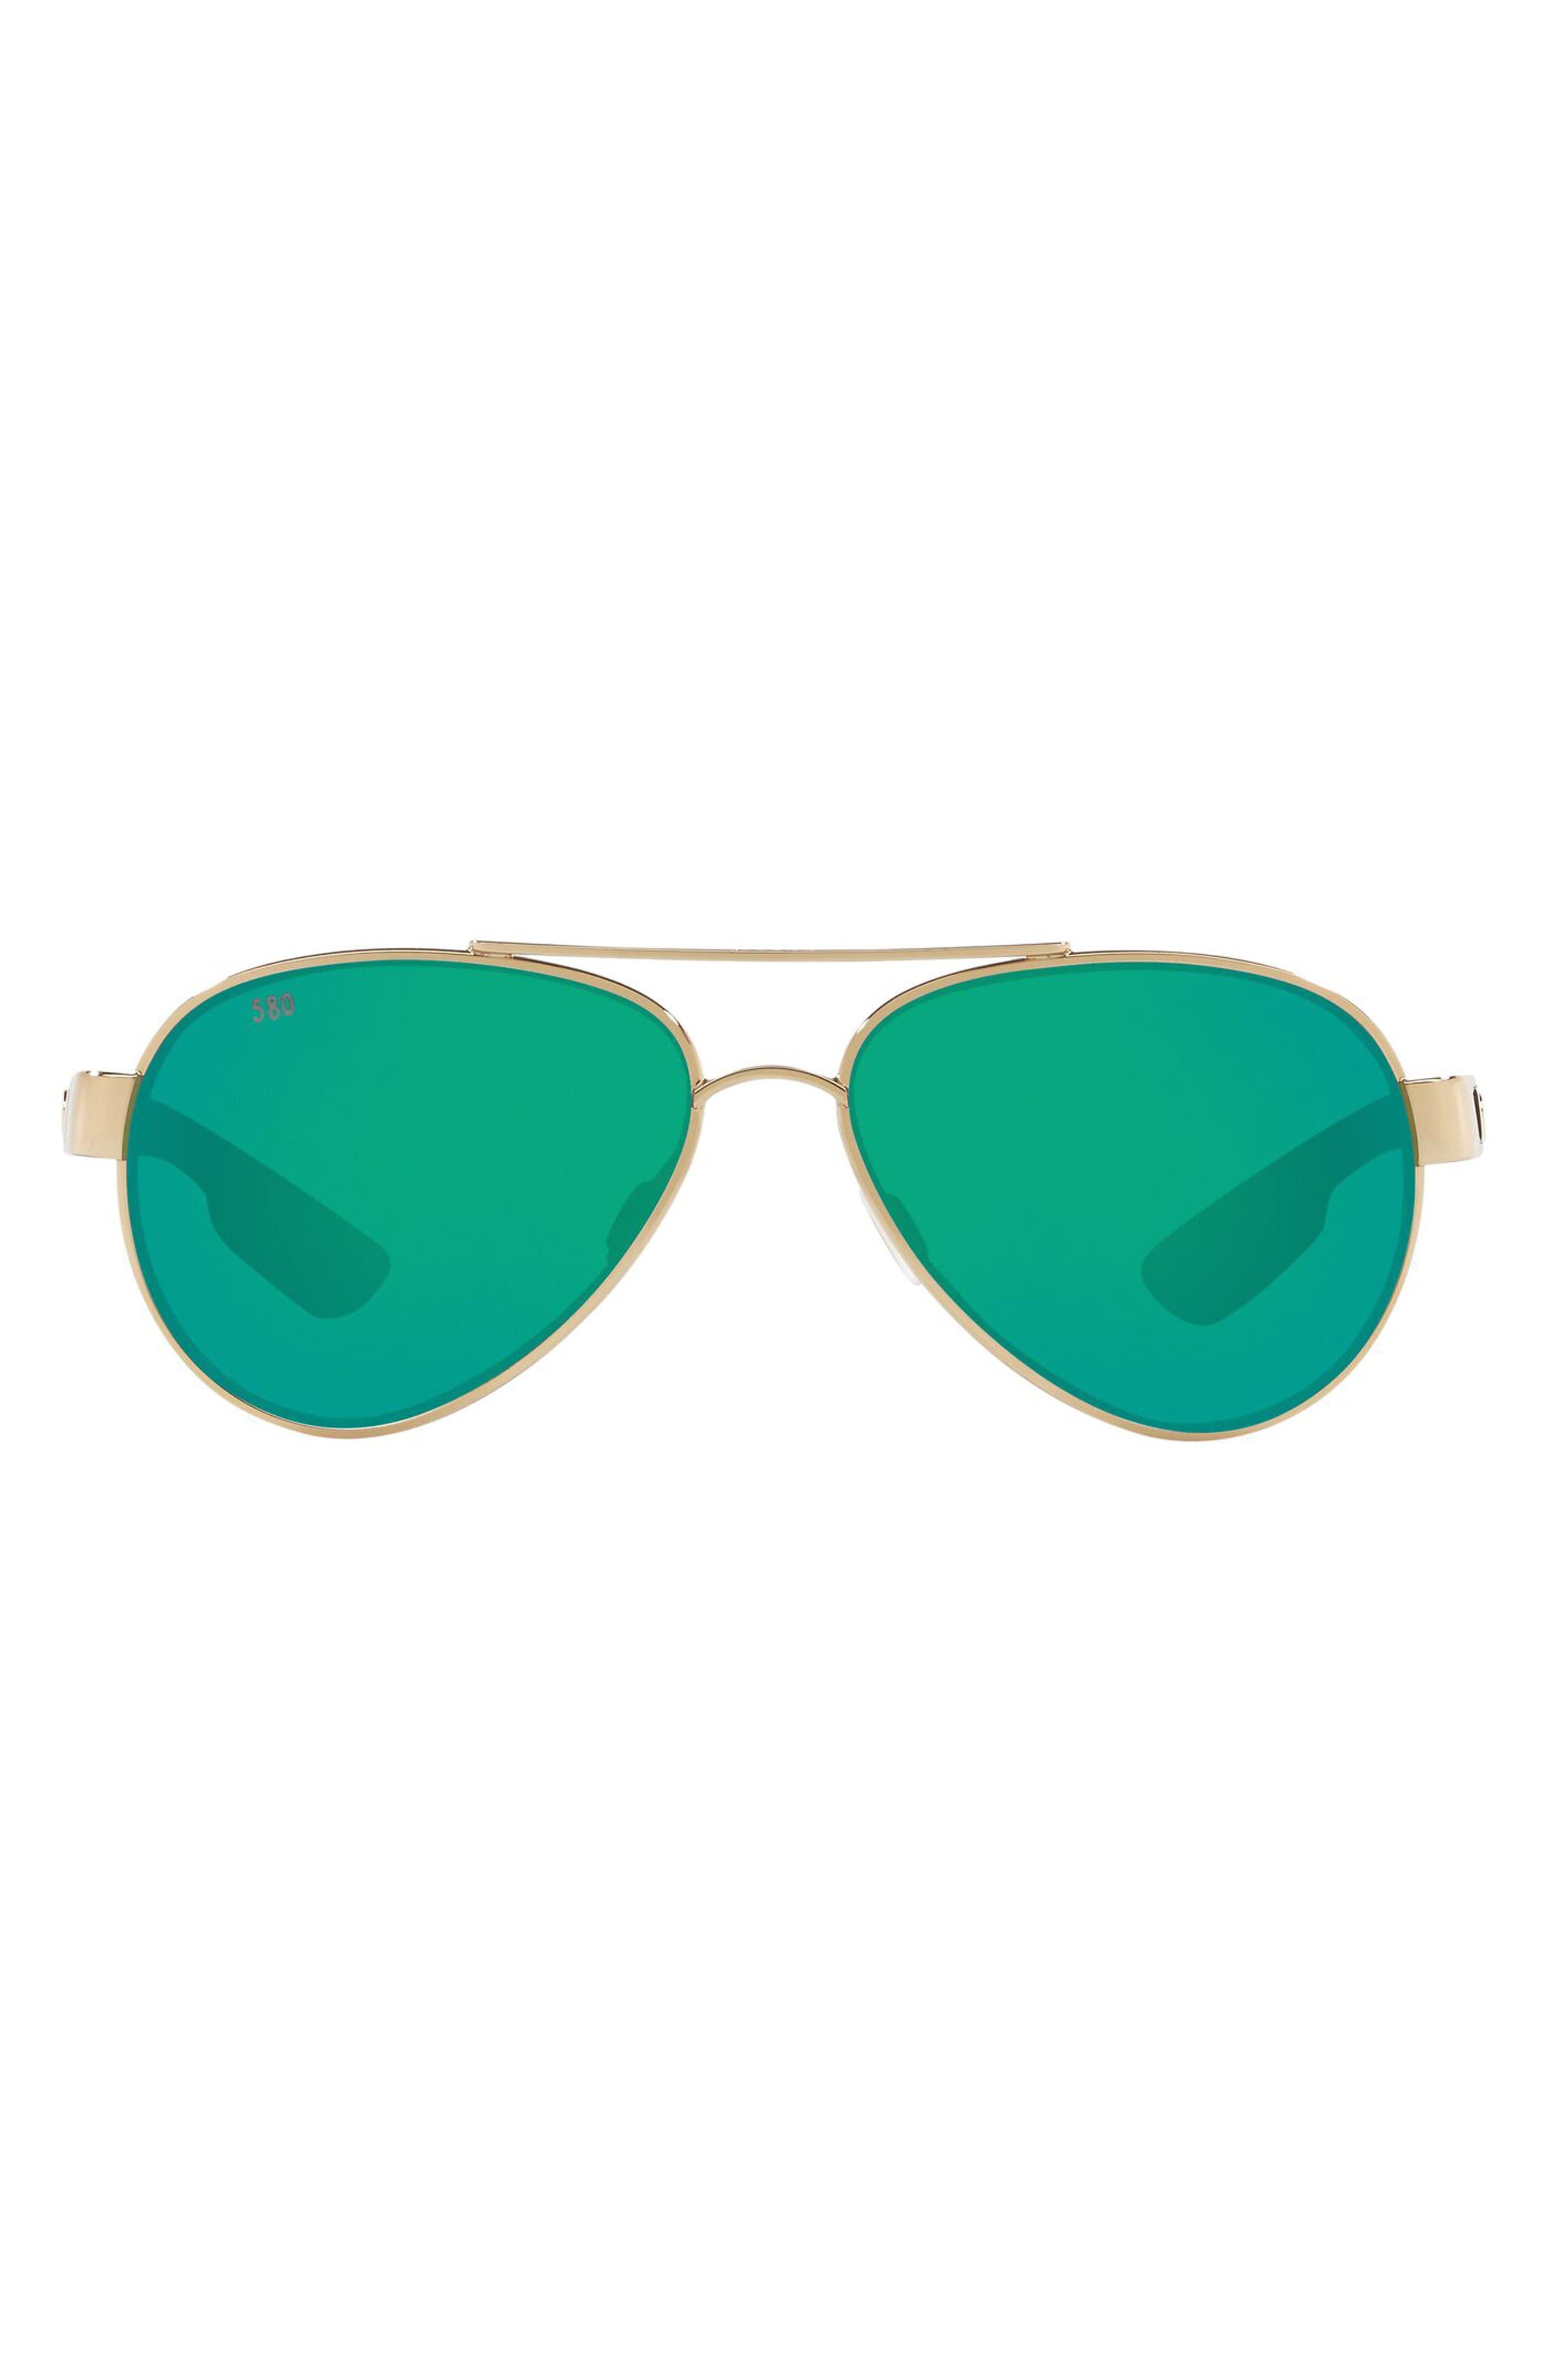 Loreto 56mm Mirrored Polarized Pilot Sunglasses